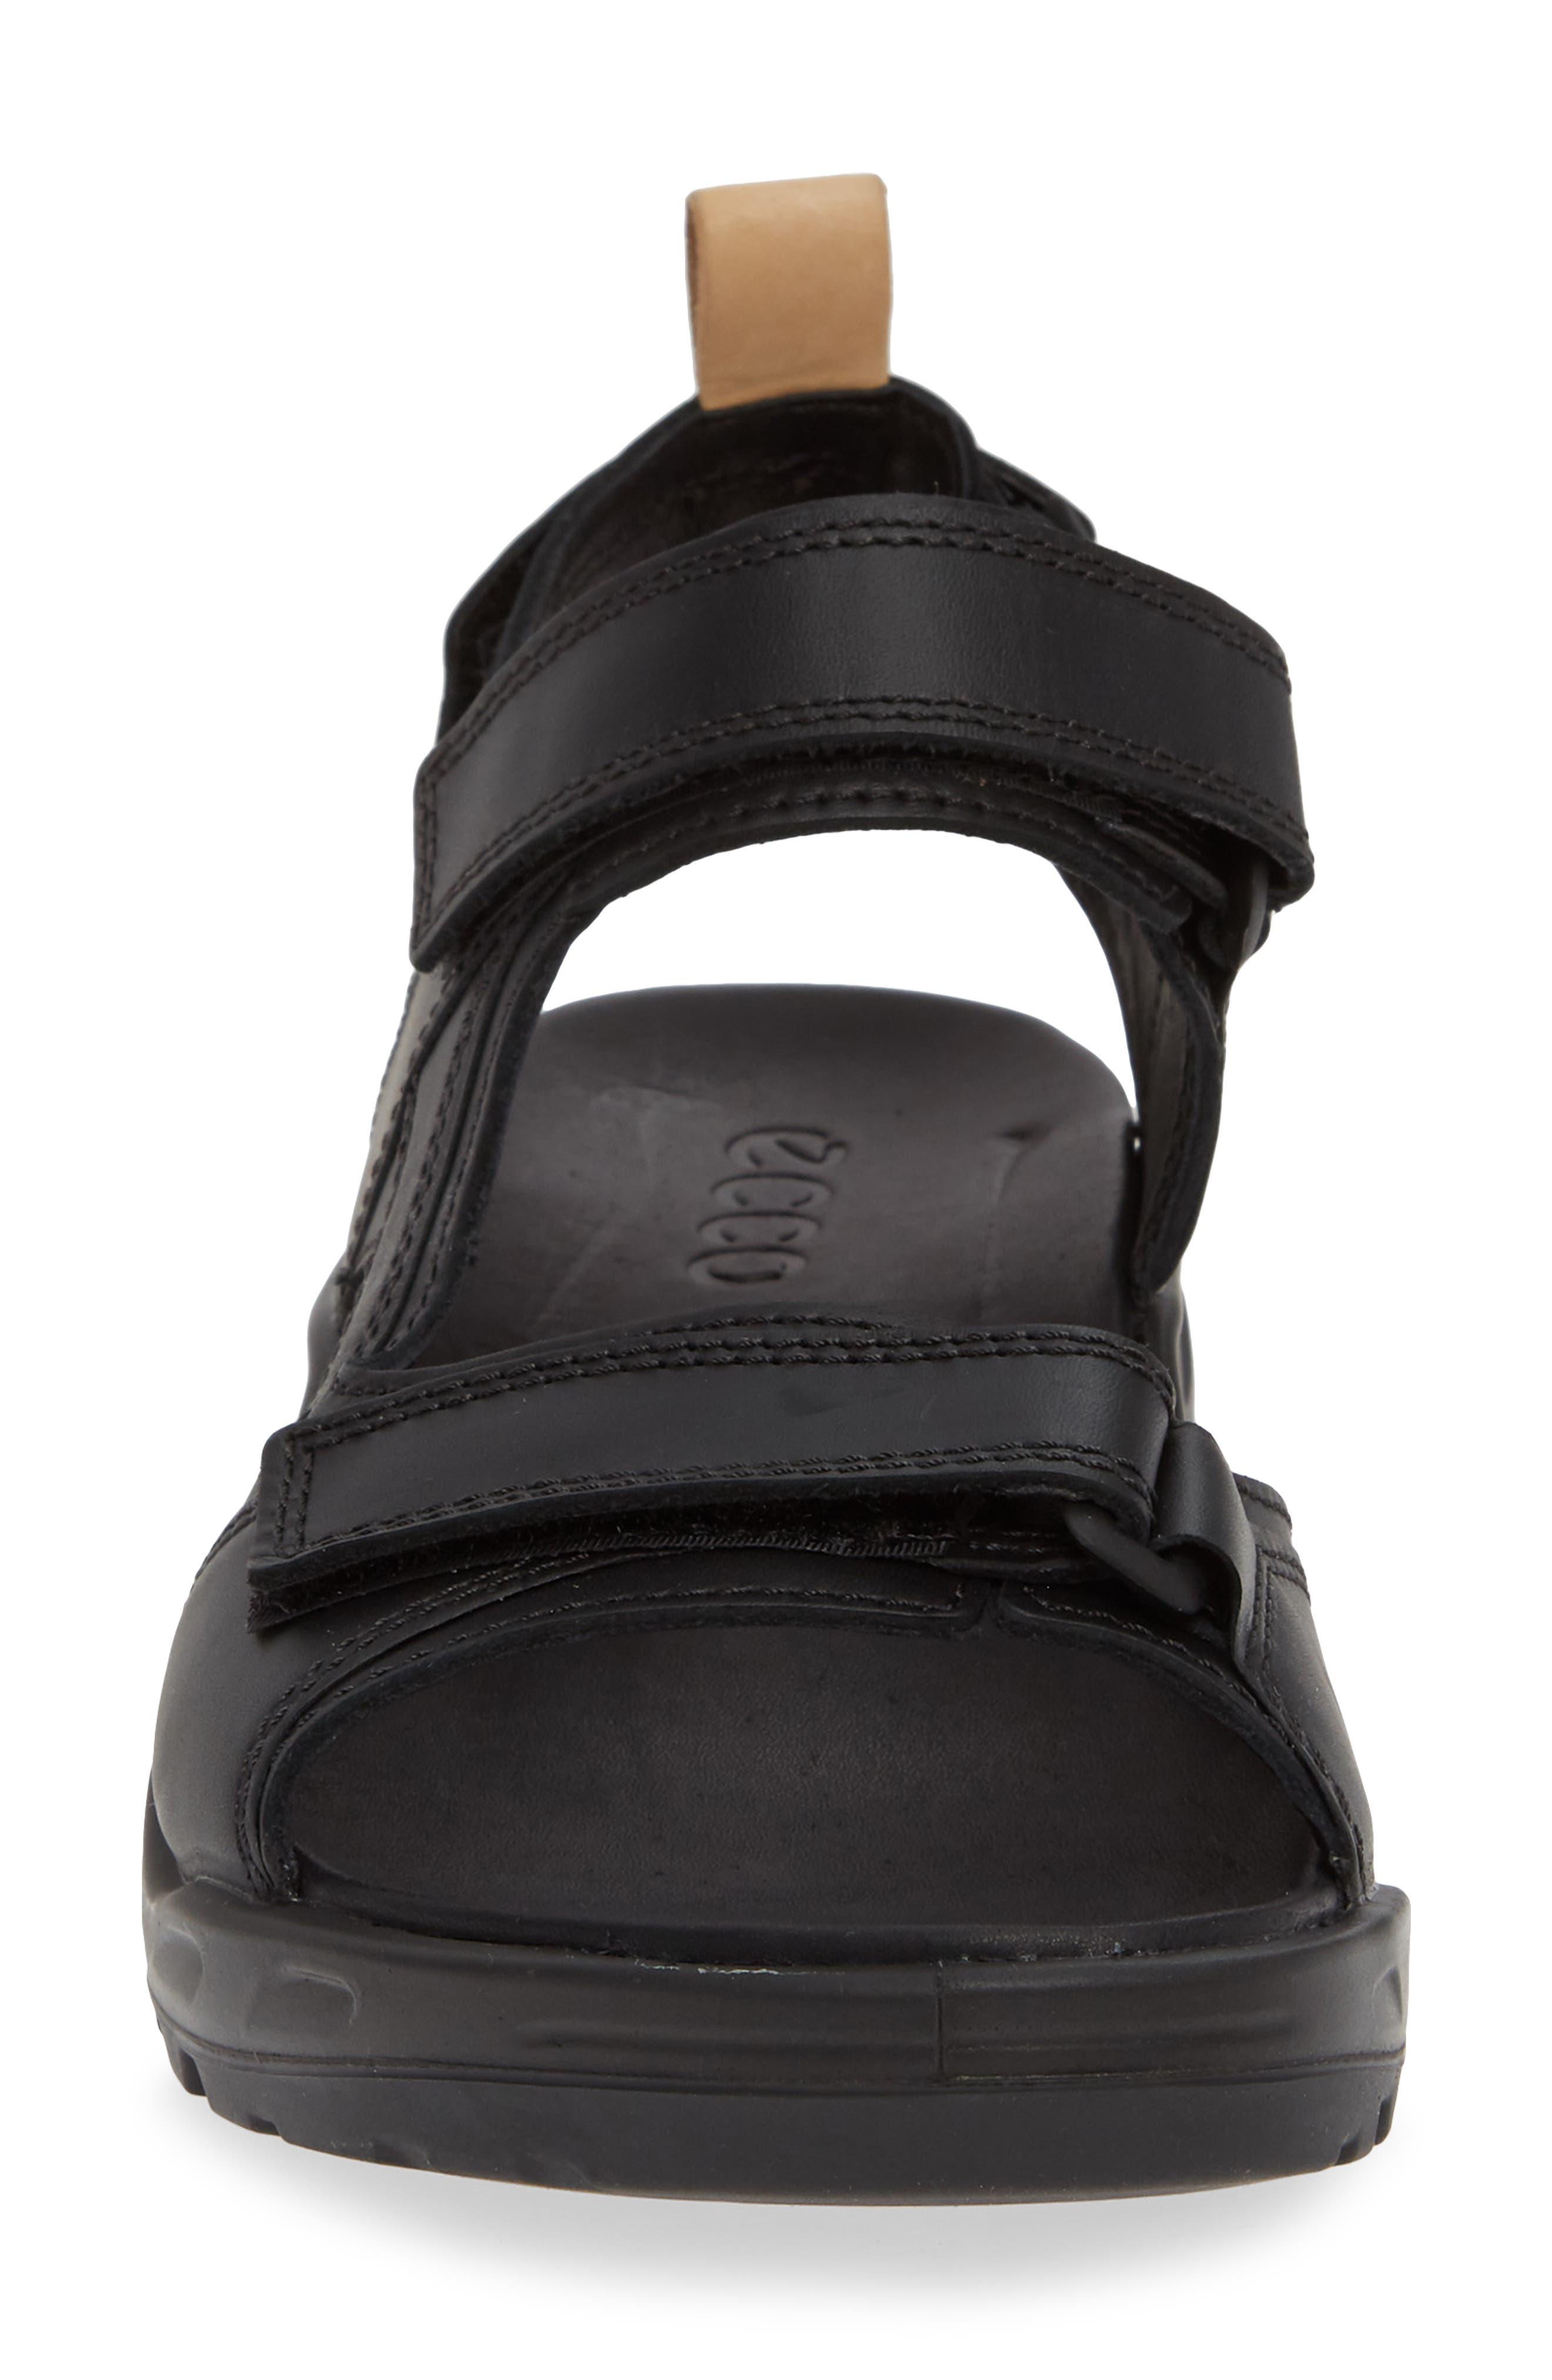 Premium Offroad Sandal,                             Alternate thumbnail 4, color,                             BLACK LEATHER